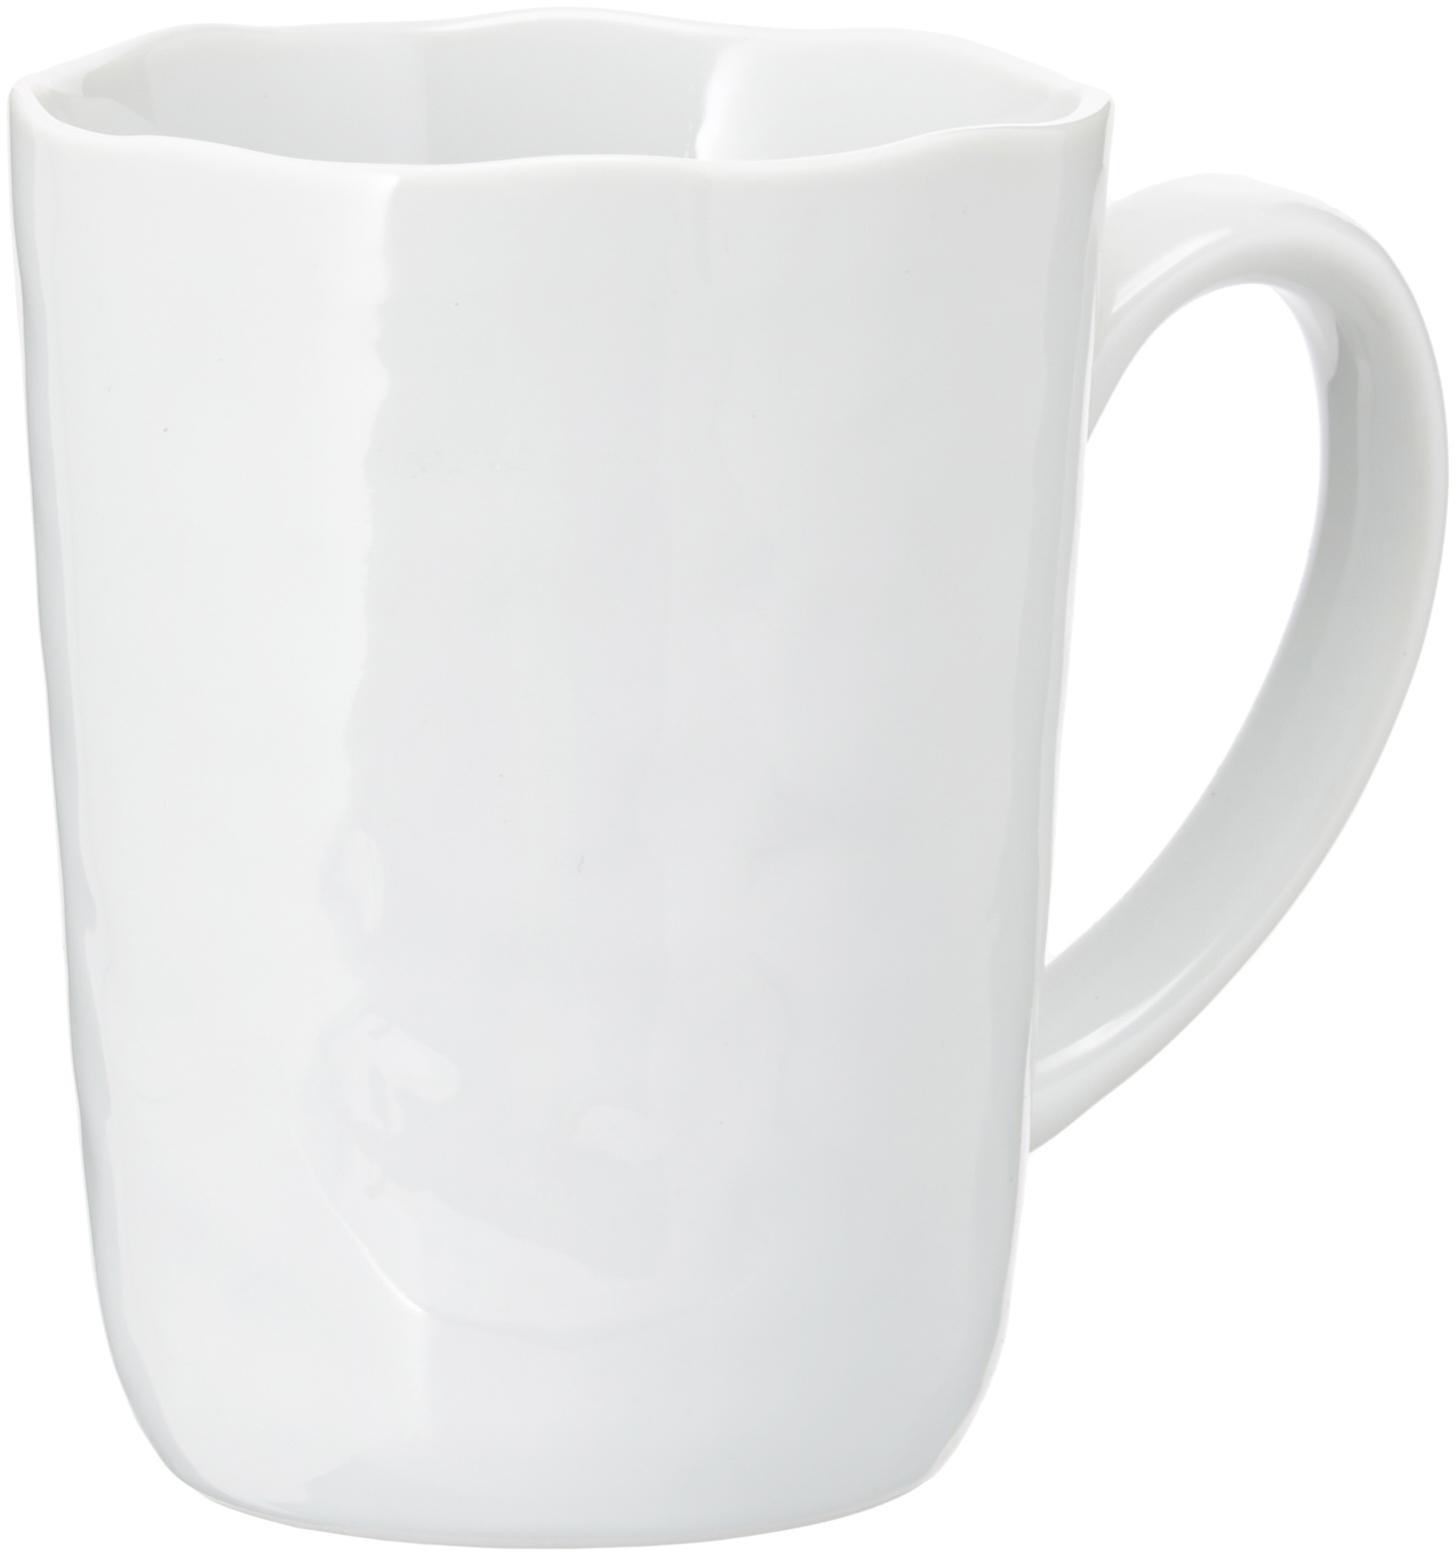 Tazza caffè con superficie irregolare Porcelino 6 pz, Porcellana, volutamente irregolare, Bianco, Ø 8 x Alt. 11 cm